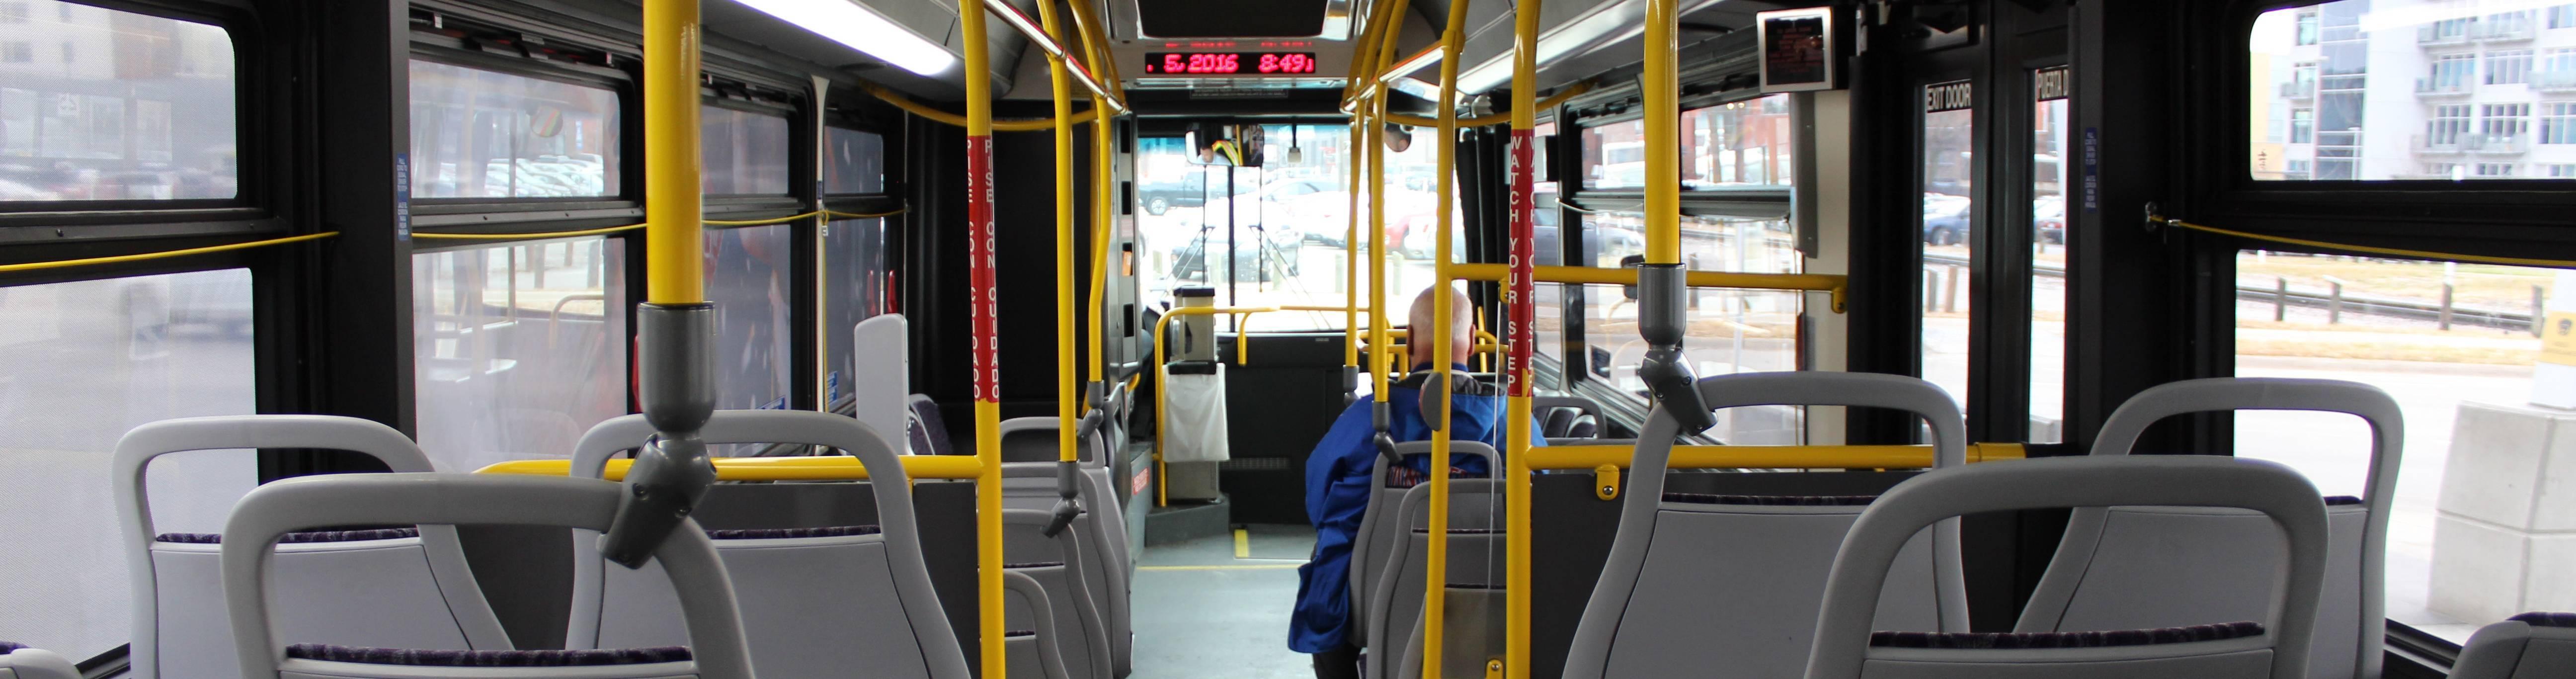 New buses enhance DART's fleet